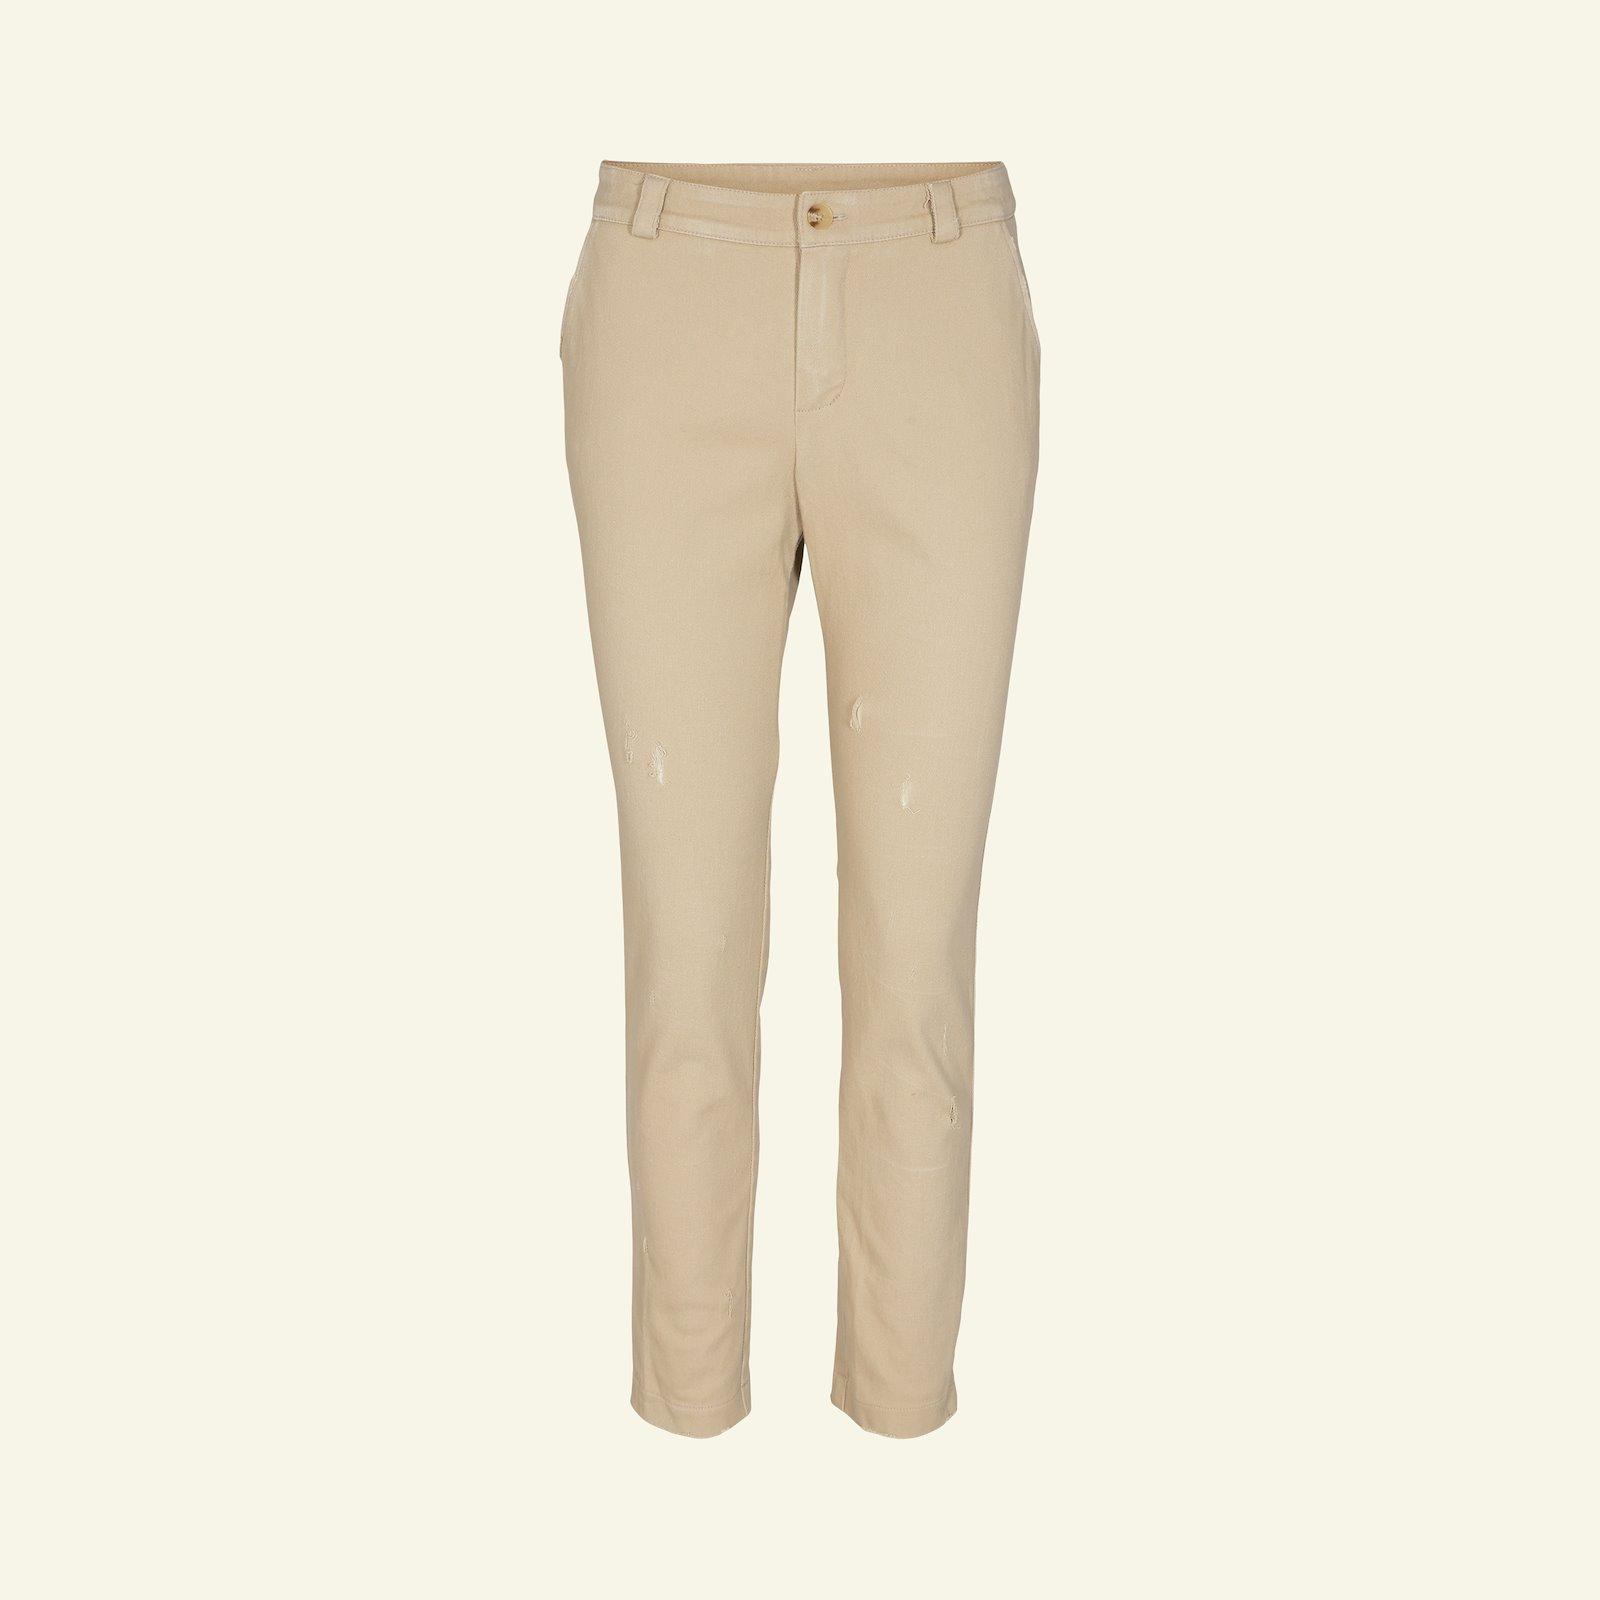 Trousers, 44/16 p20033_460842_sskit